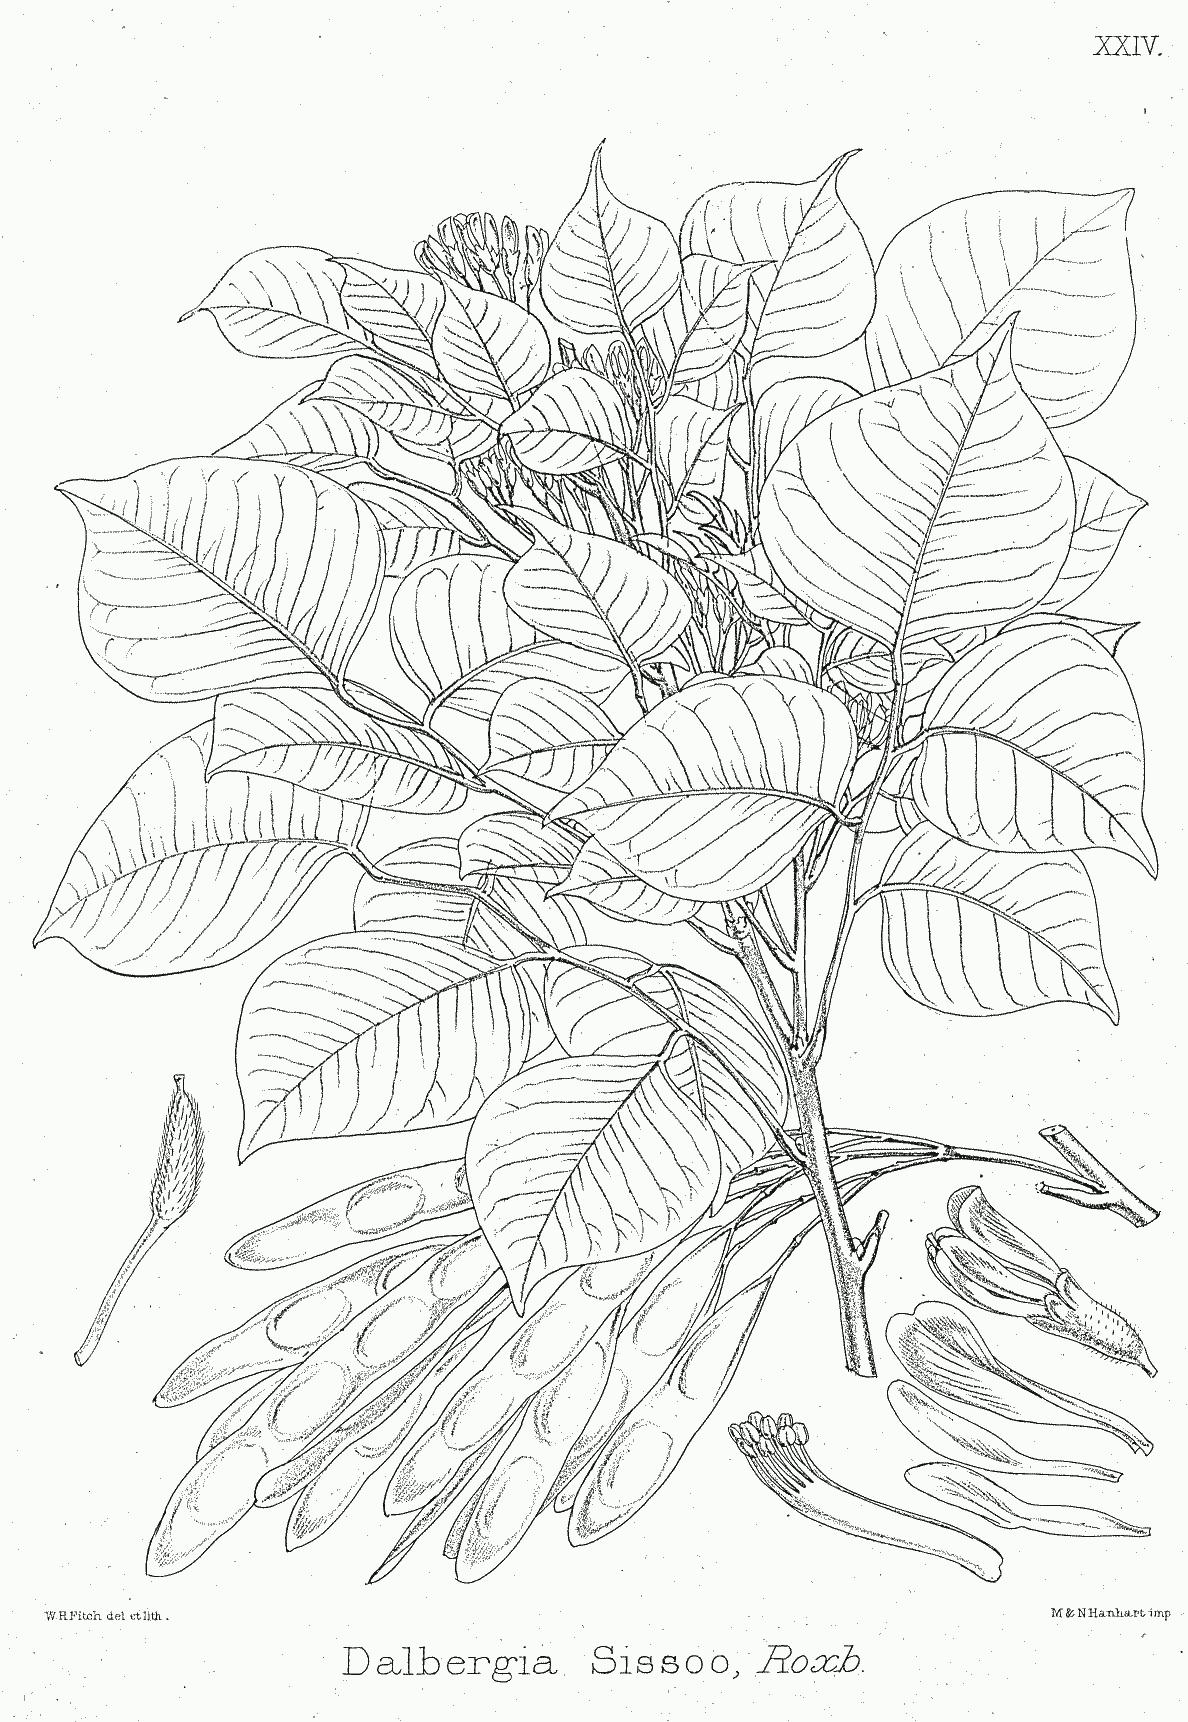 dalbergia sissoo wikipedia